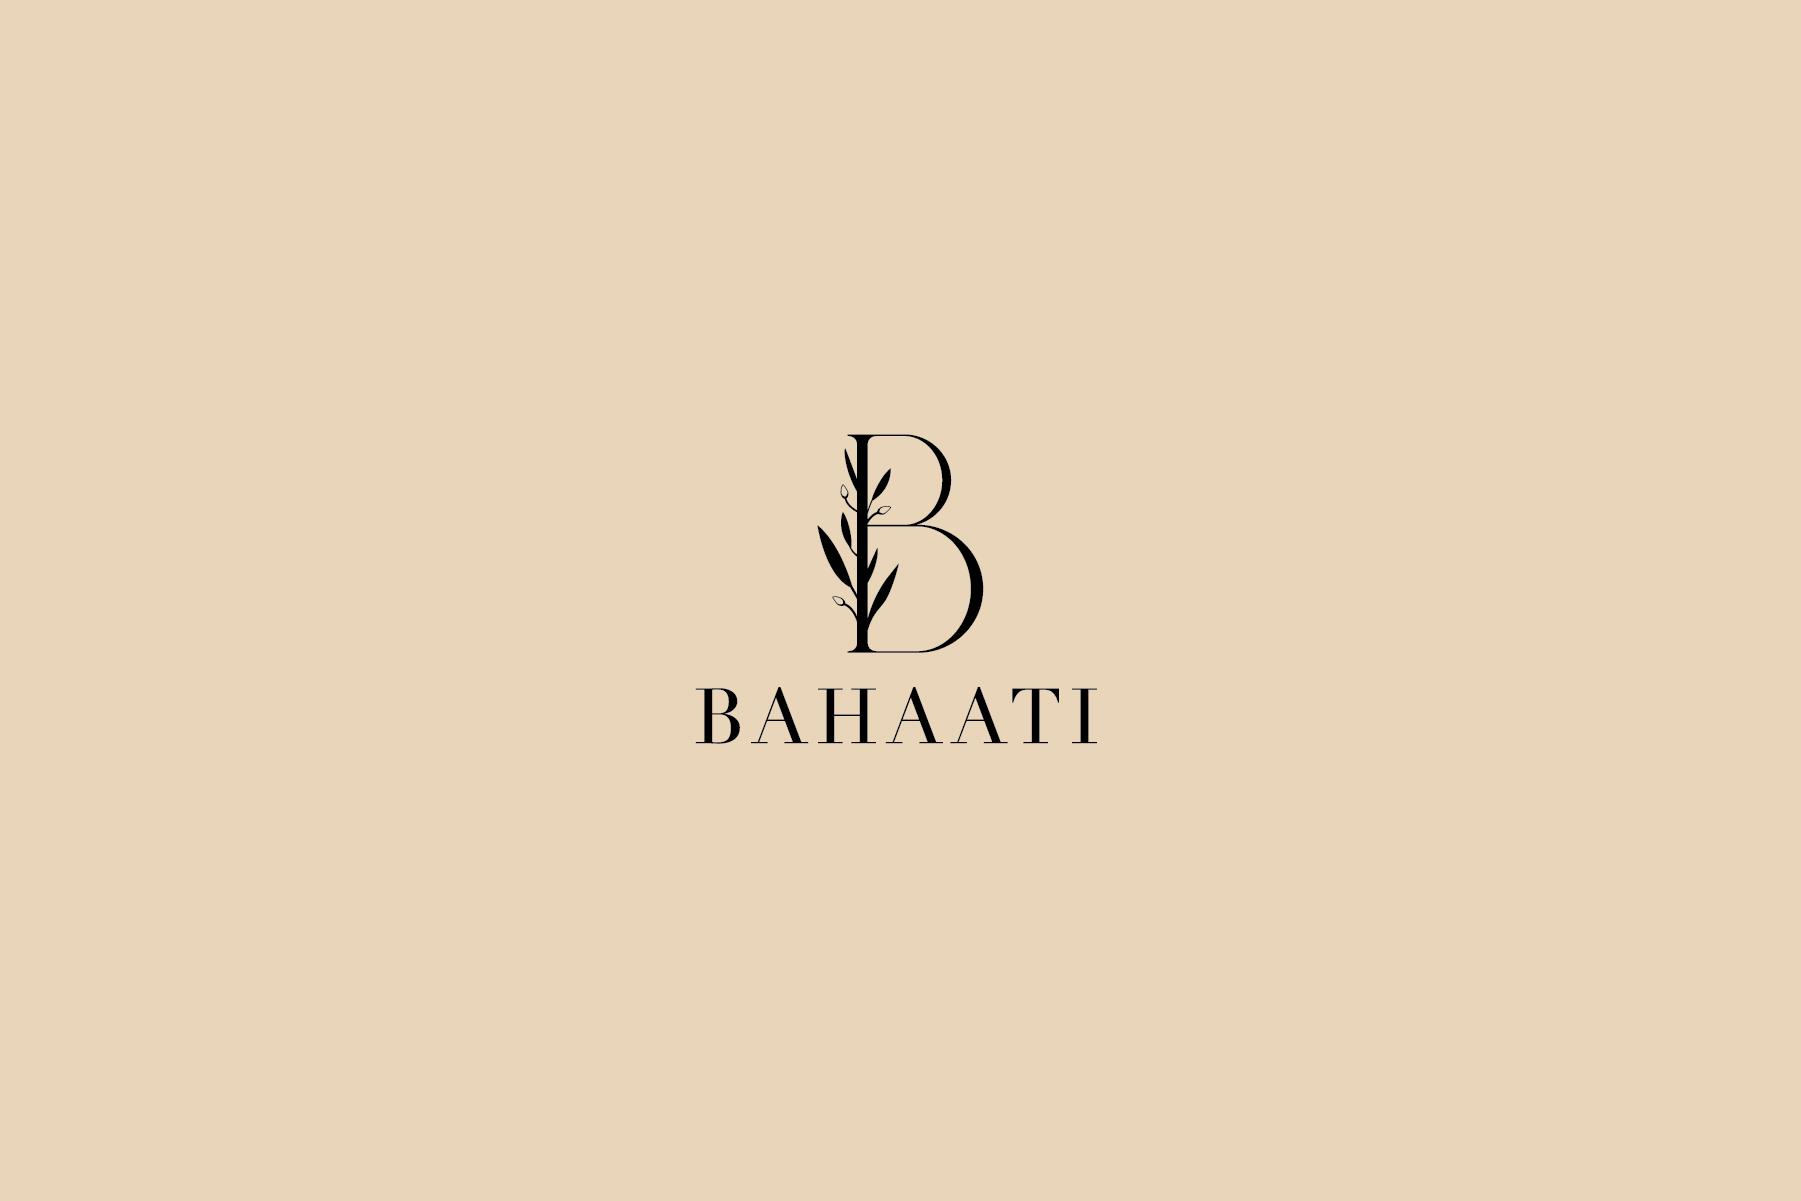 Bahaati